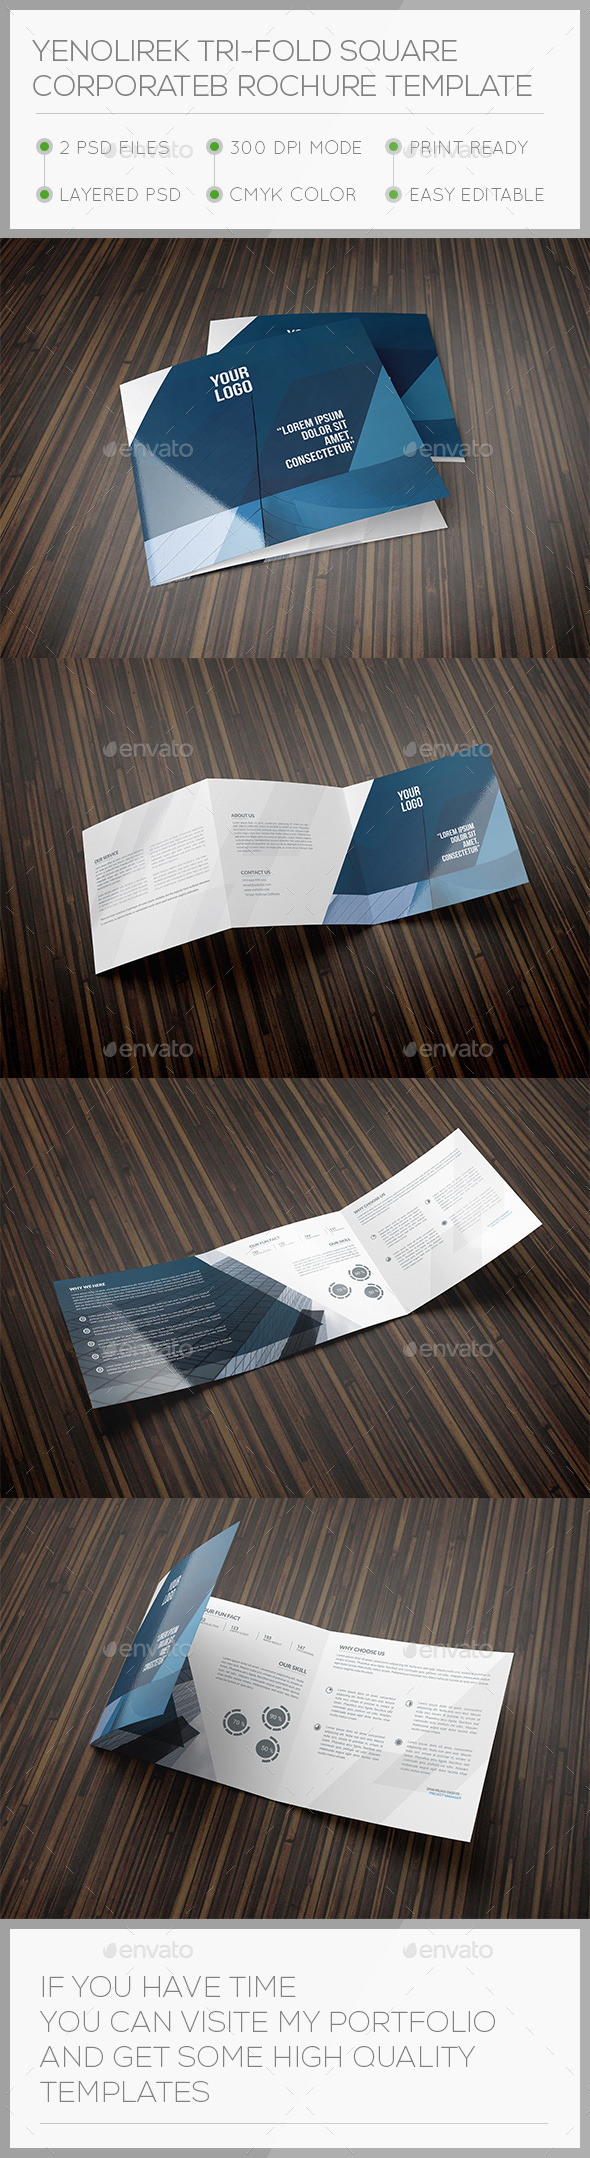 Yenolirek Square Trifold Brochure Template - Brochures Print Templates